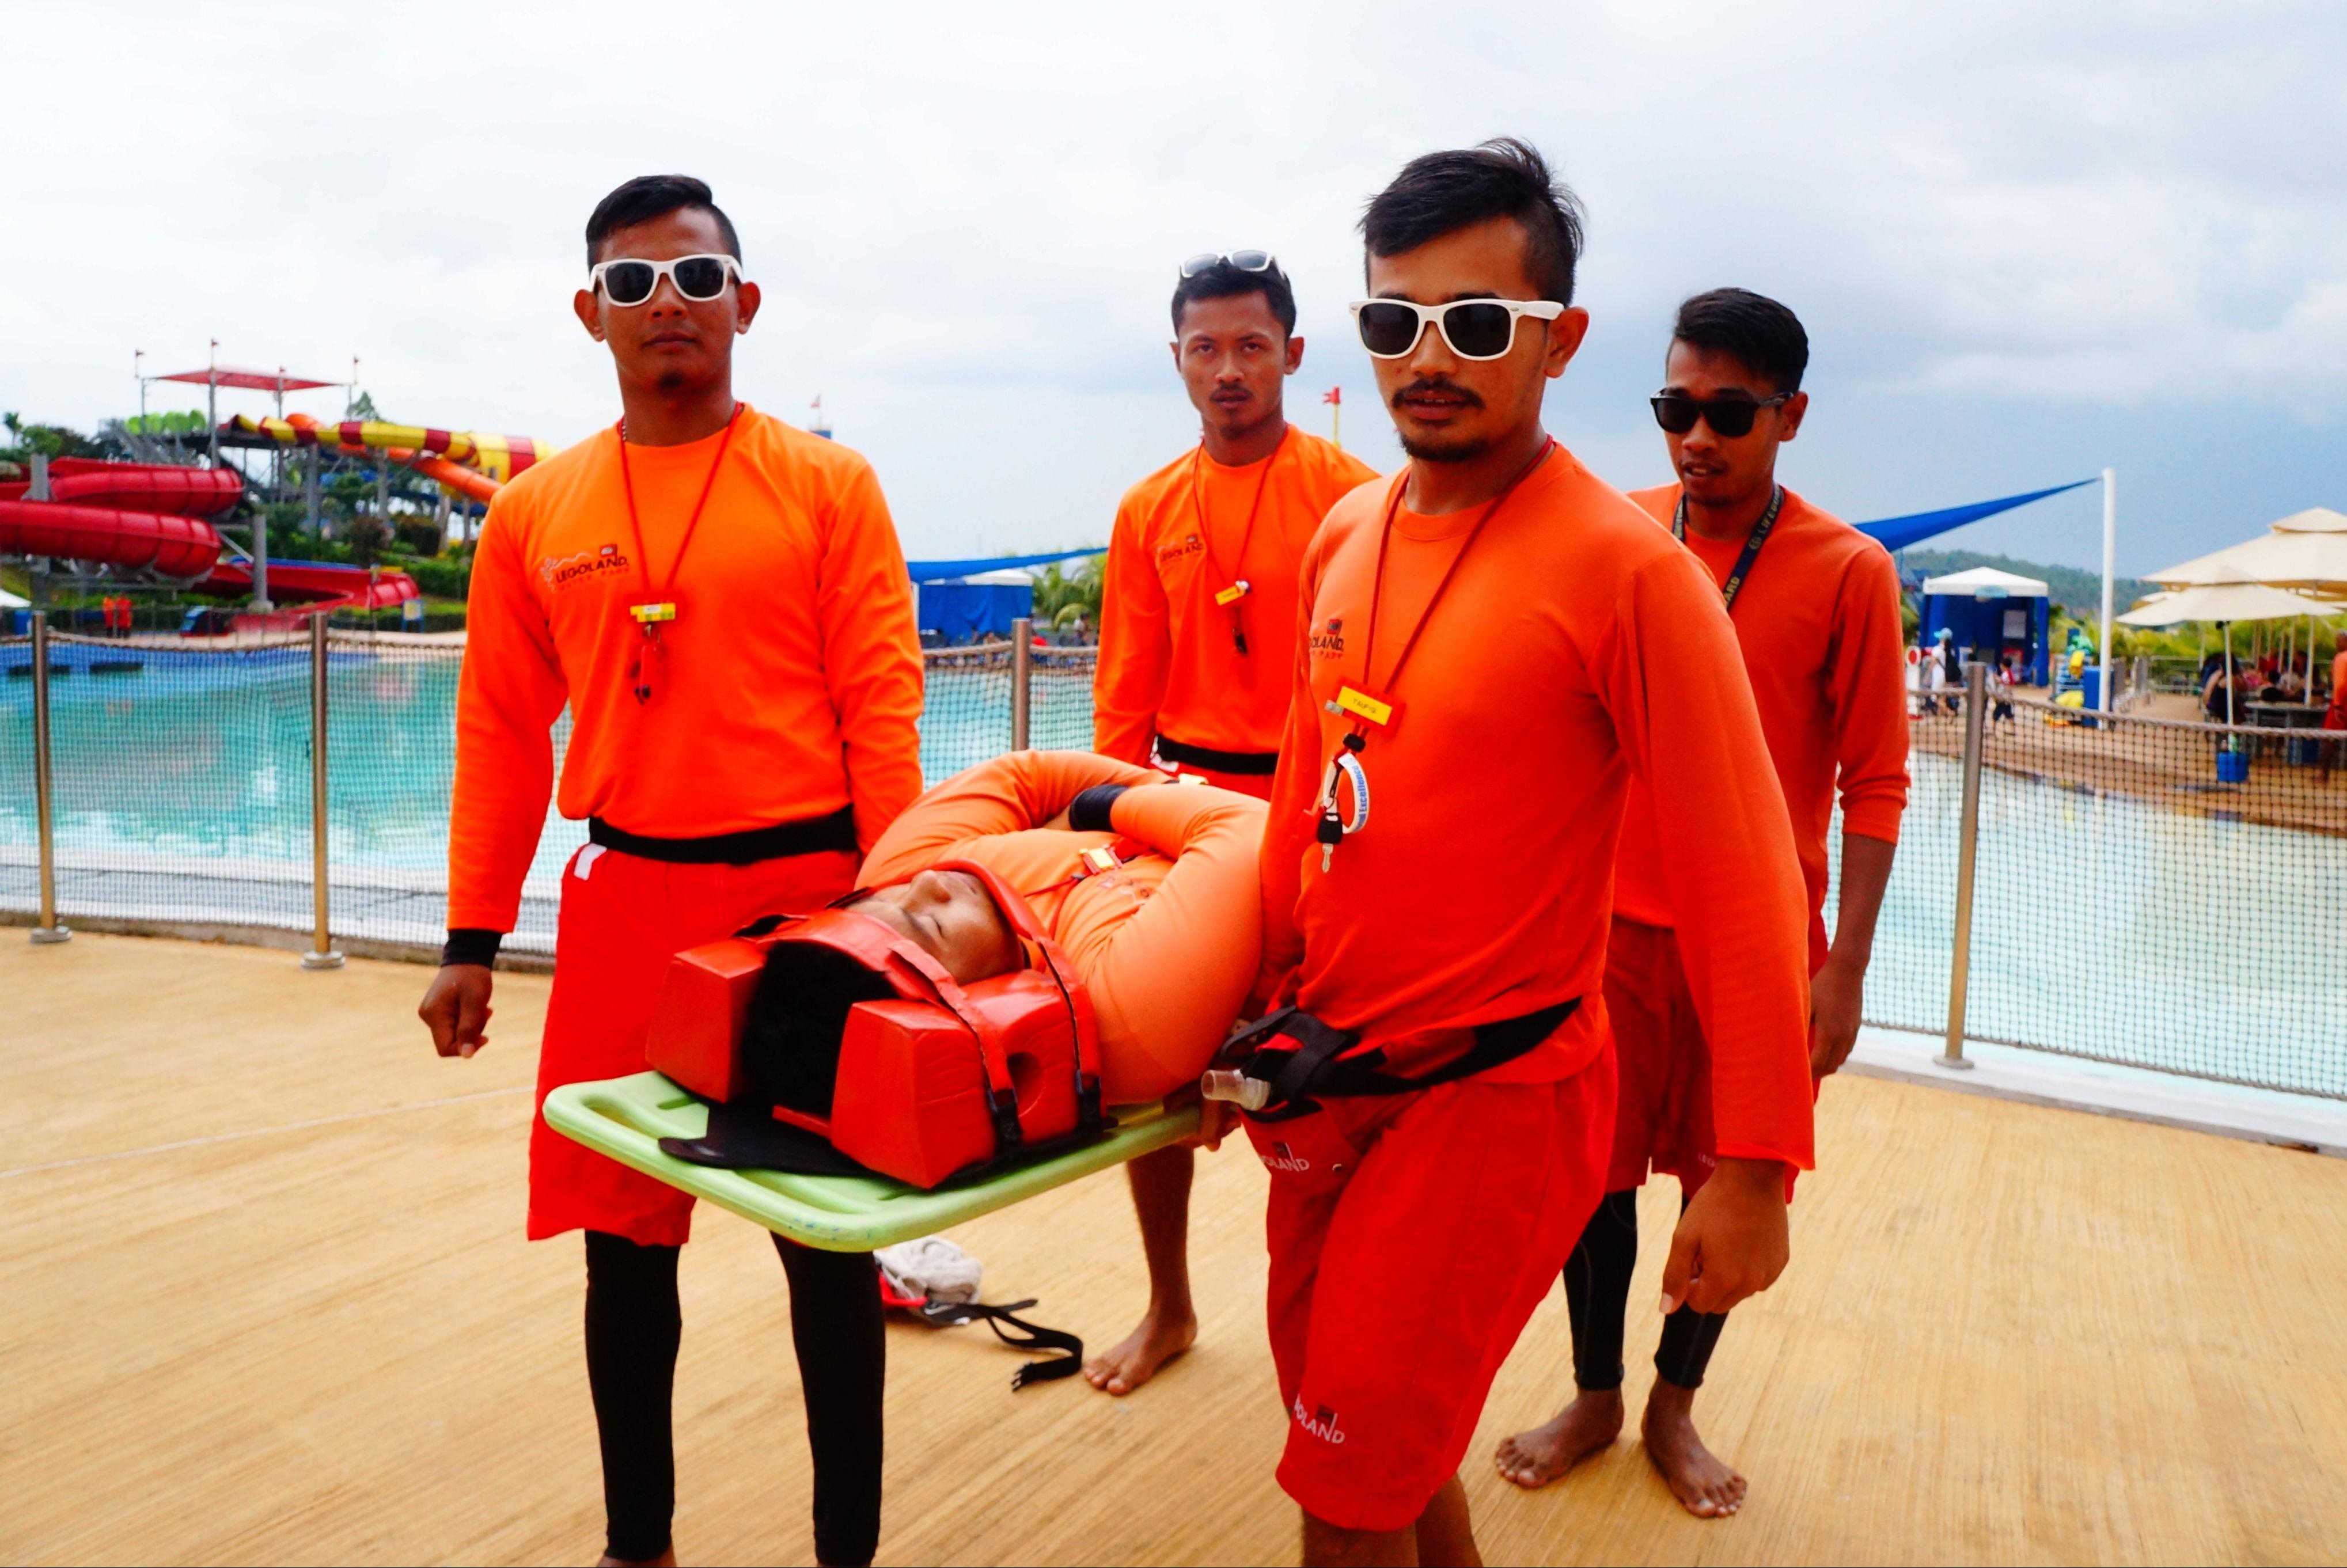 college essays on lifeguarding